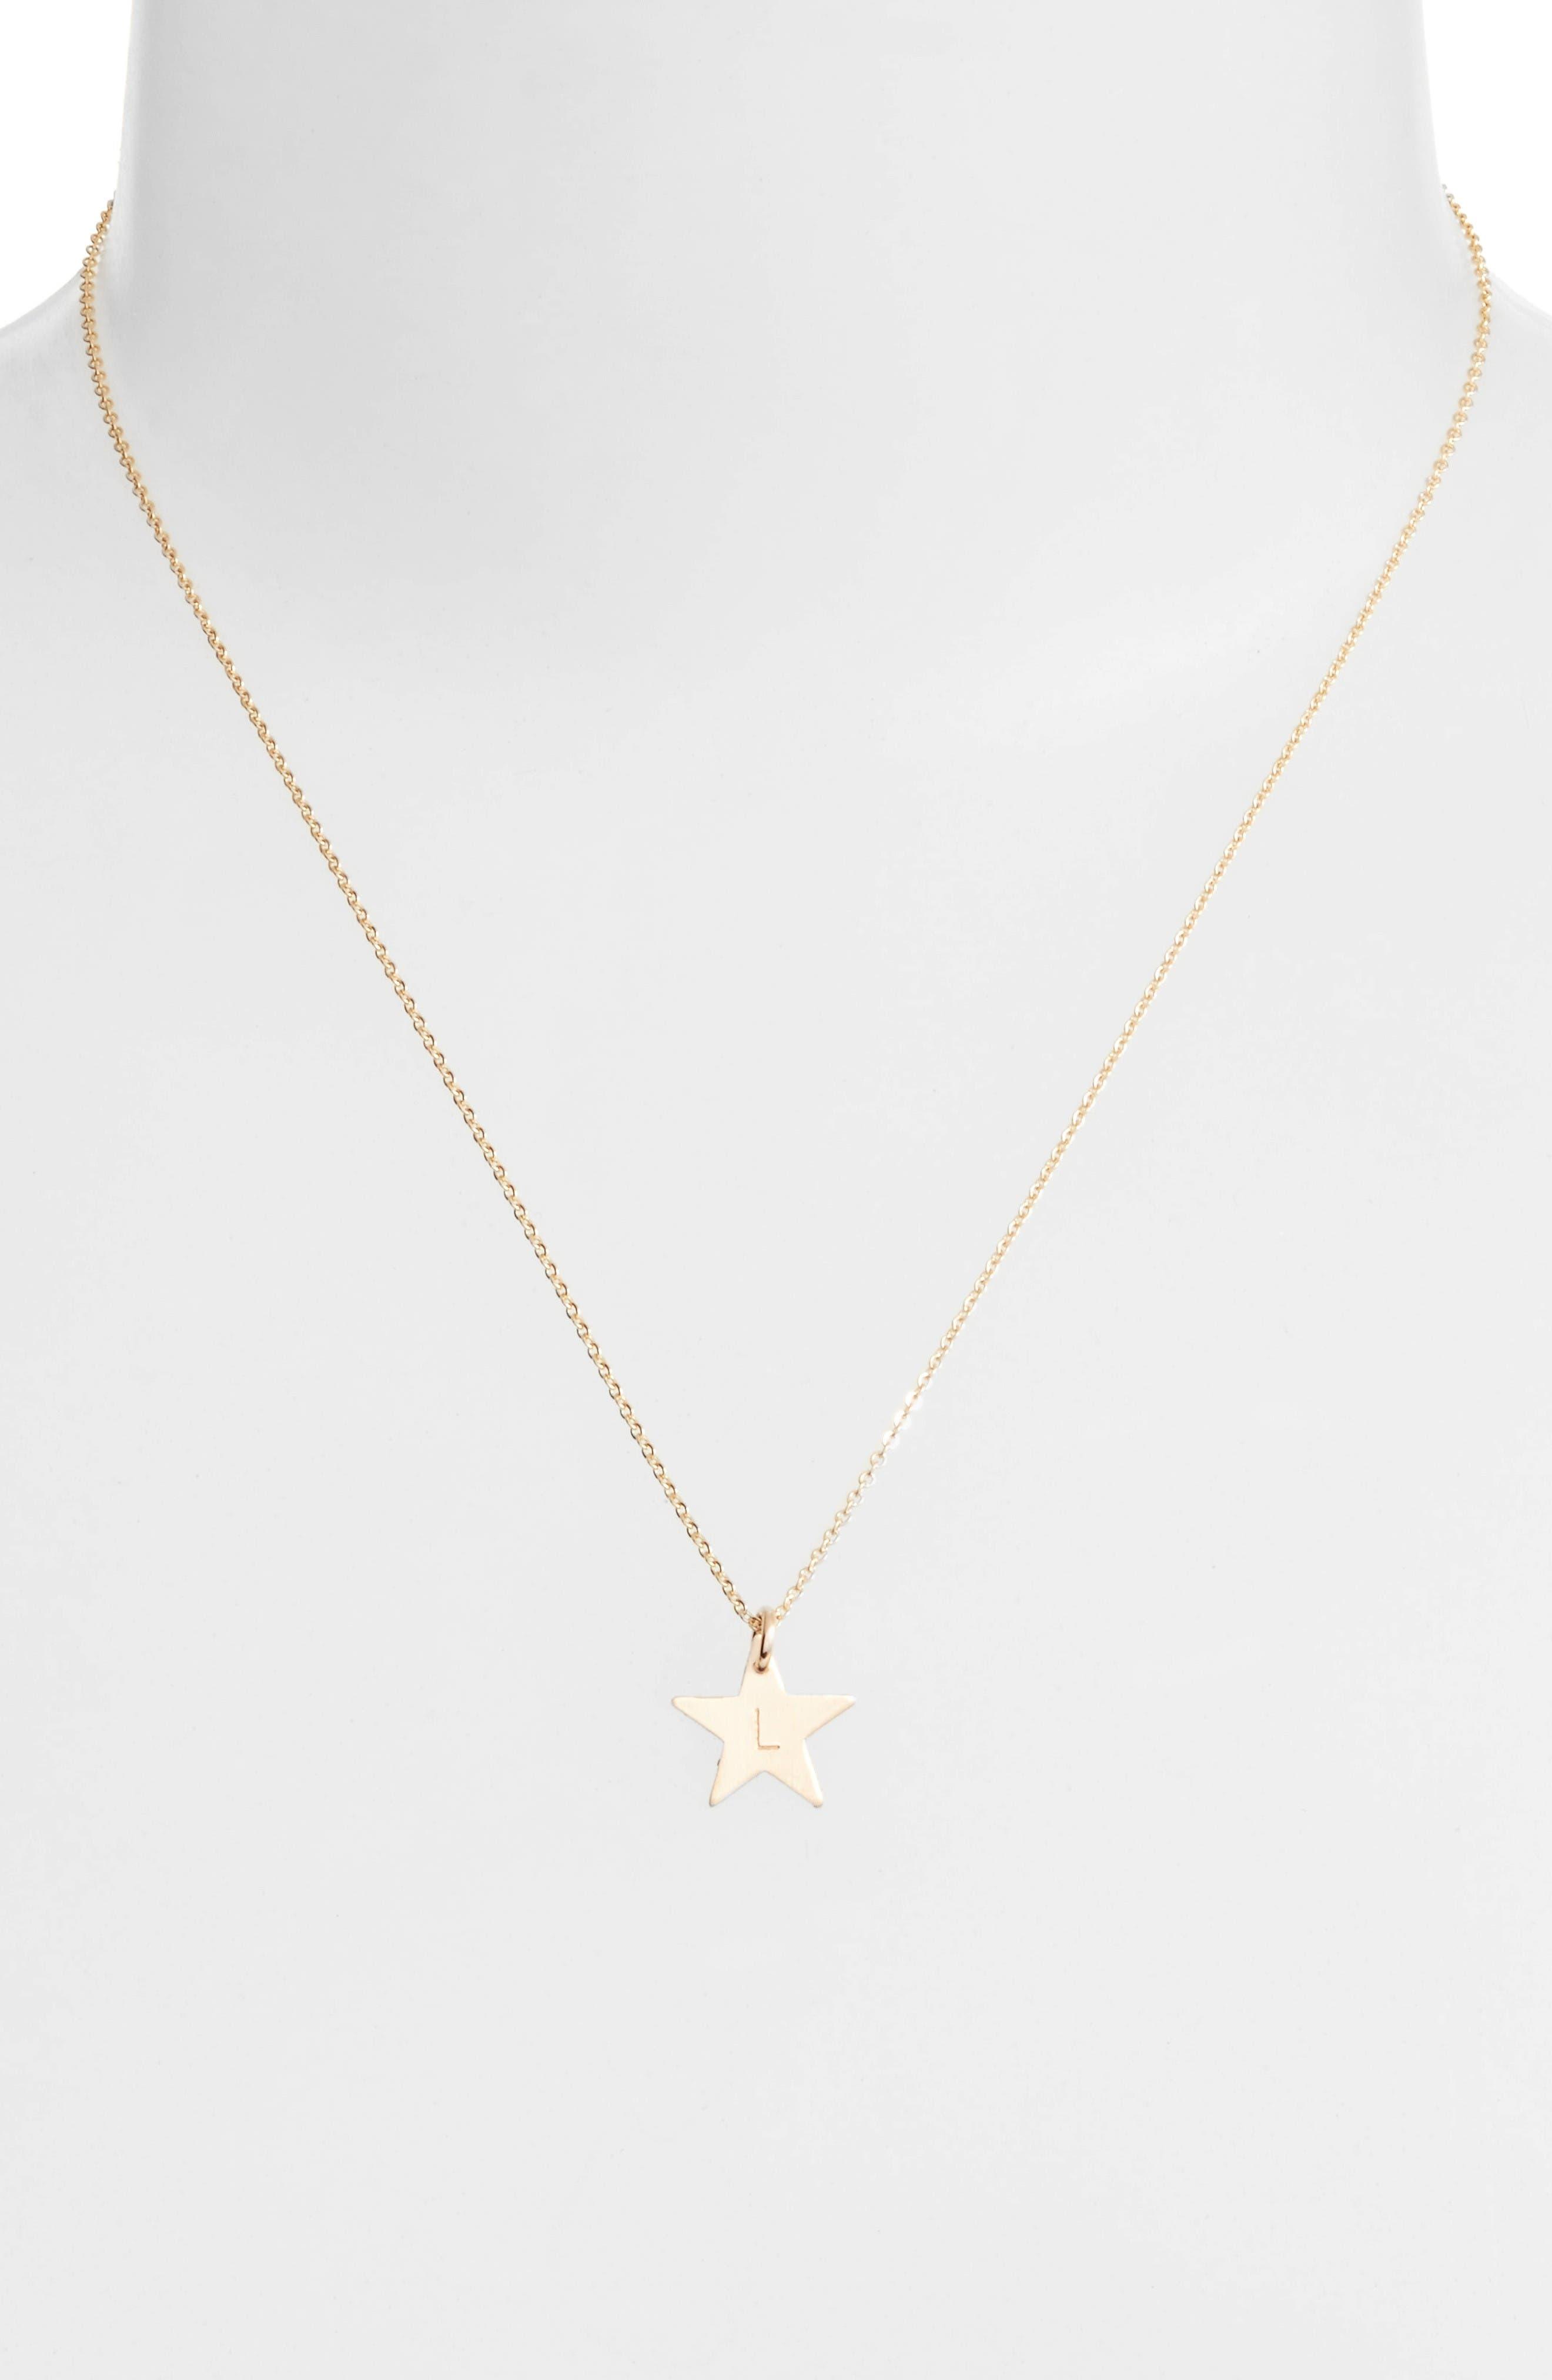 14k-Gold Fill Initial Mini Star Pendant Necklace,                             Alternate thumbnail 2, color,                             Gold/ L